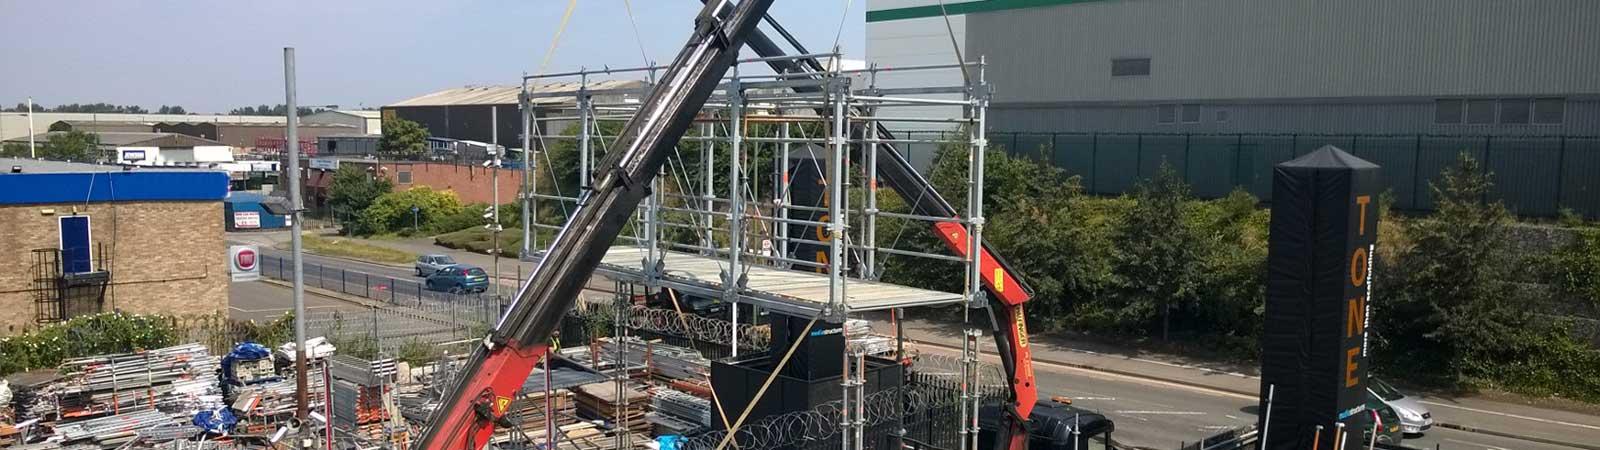 slider-logistics-cranes-1600x450px